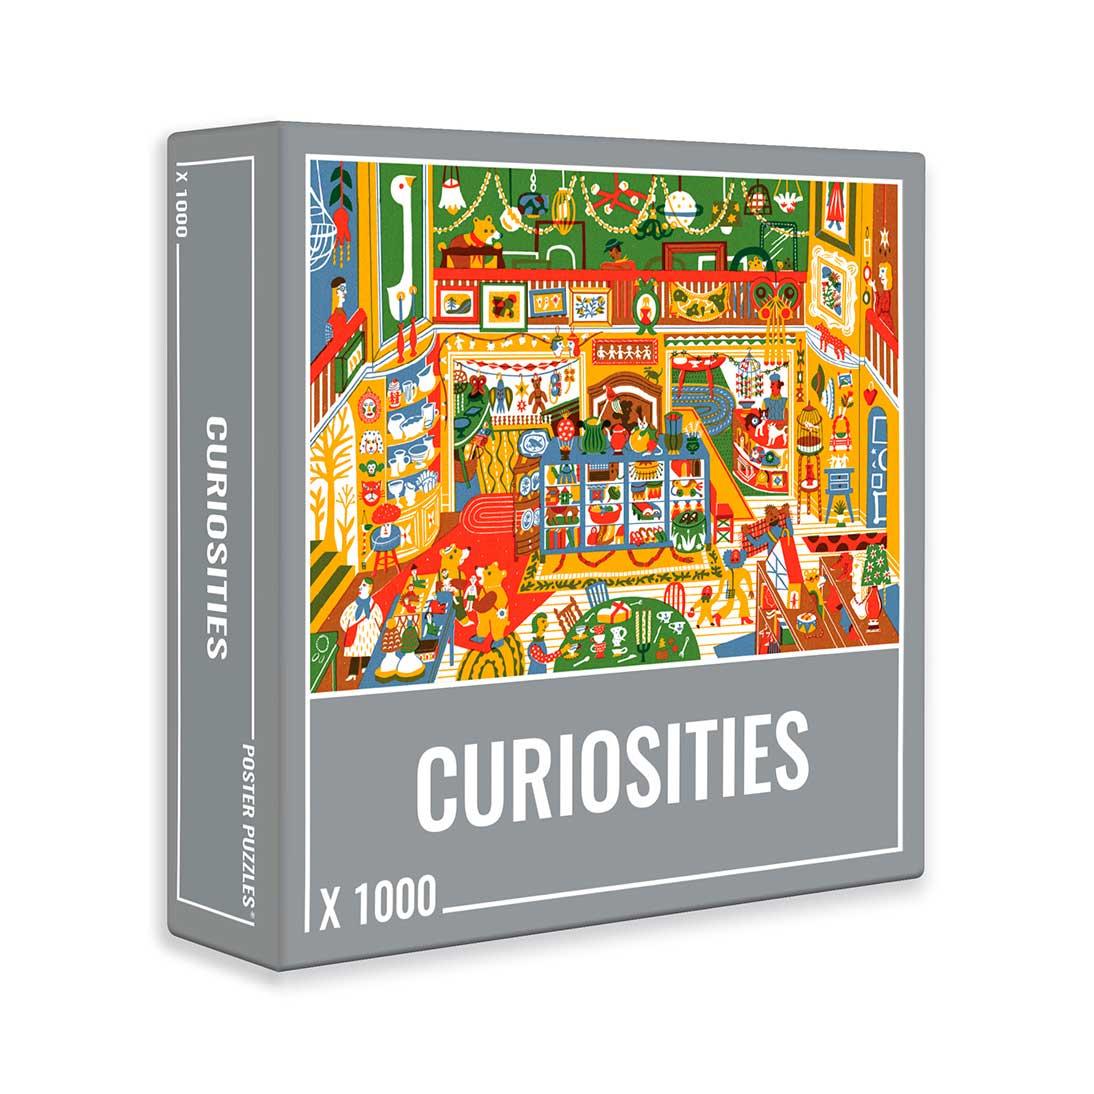 Puzzle Cloudberries Curiosities de 1000 Piezas